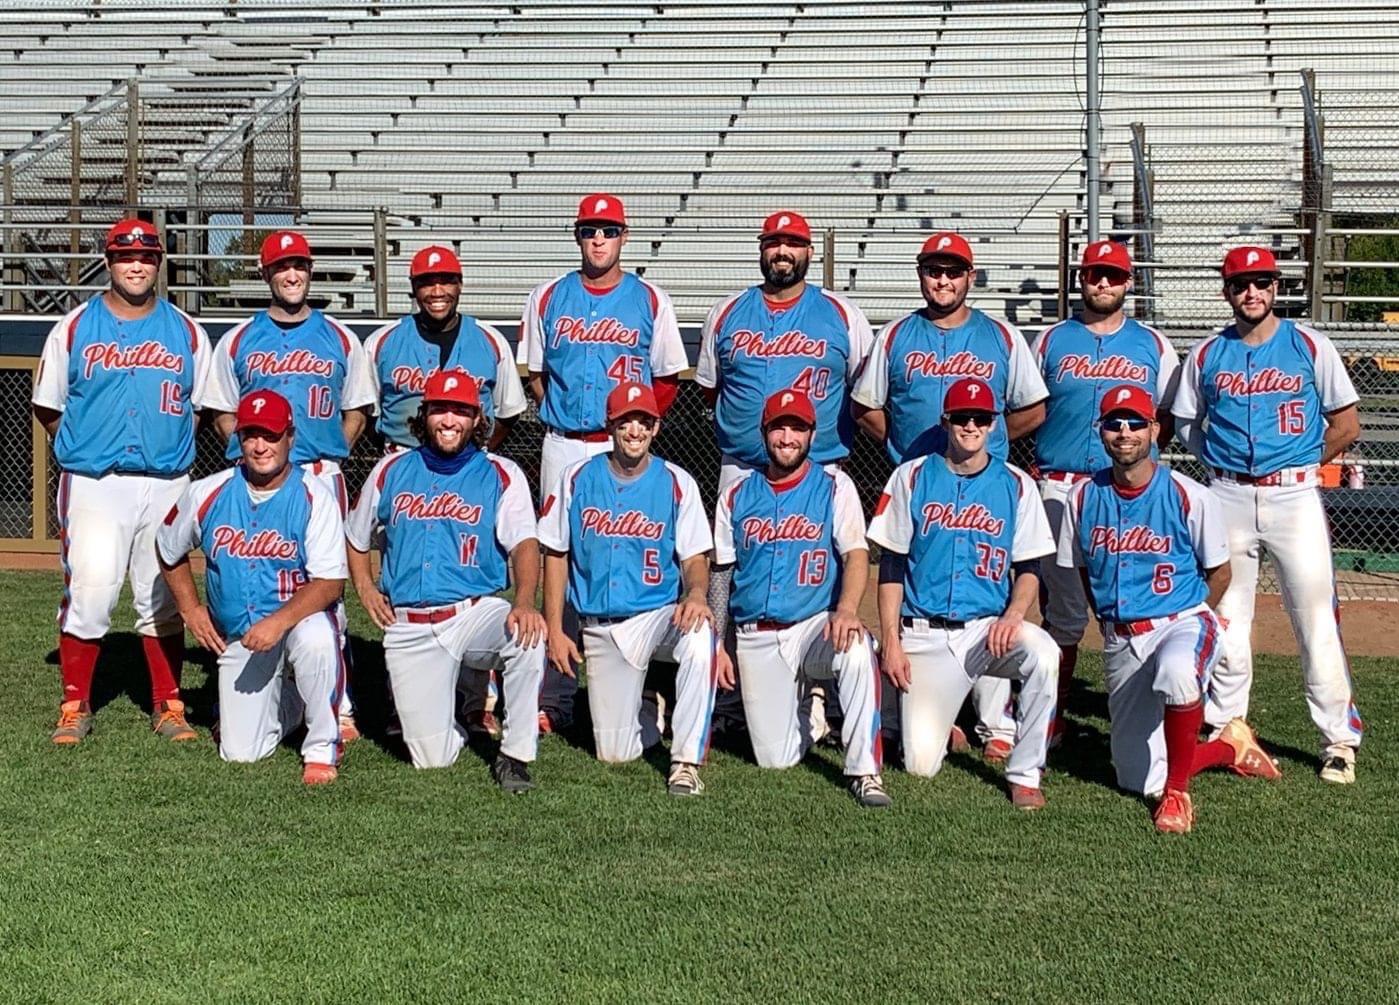 2020 25+ Phillies Champion Photo .JPG